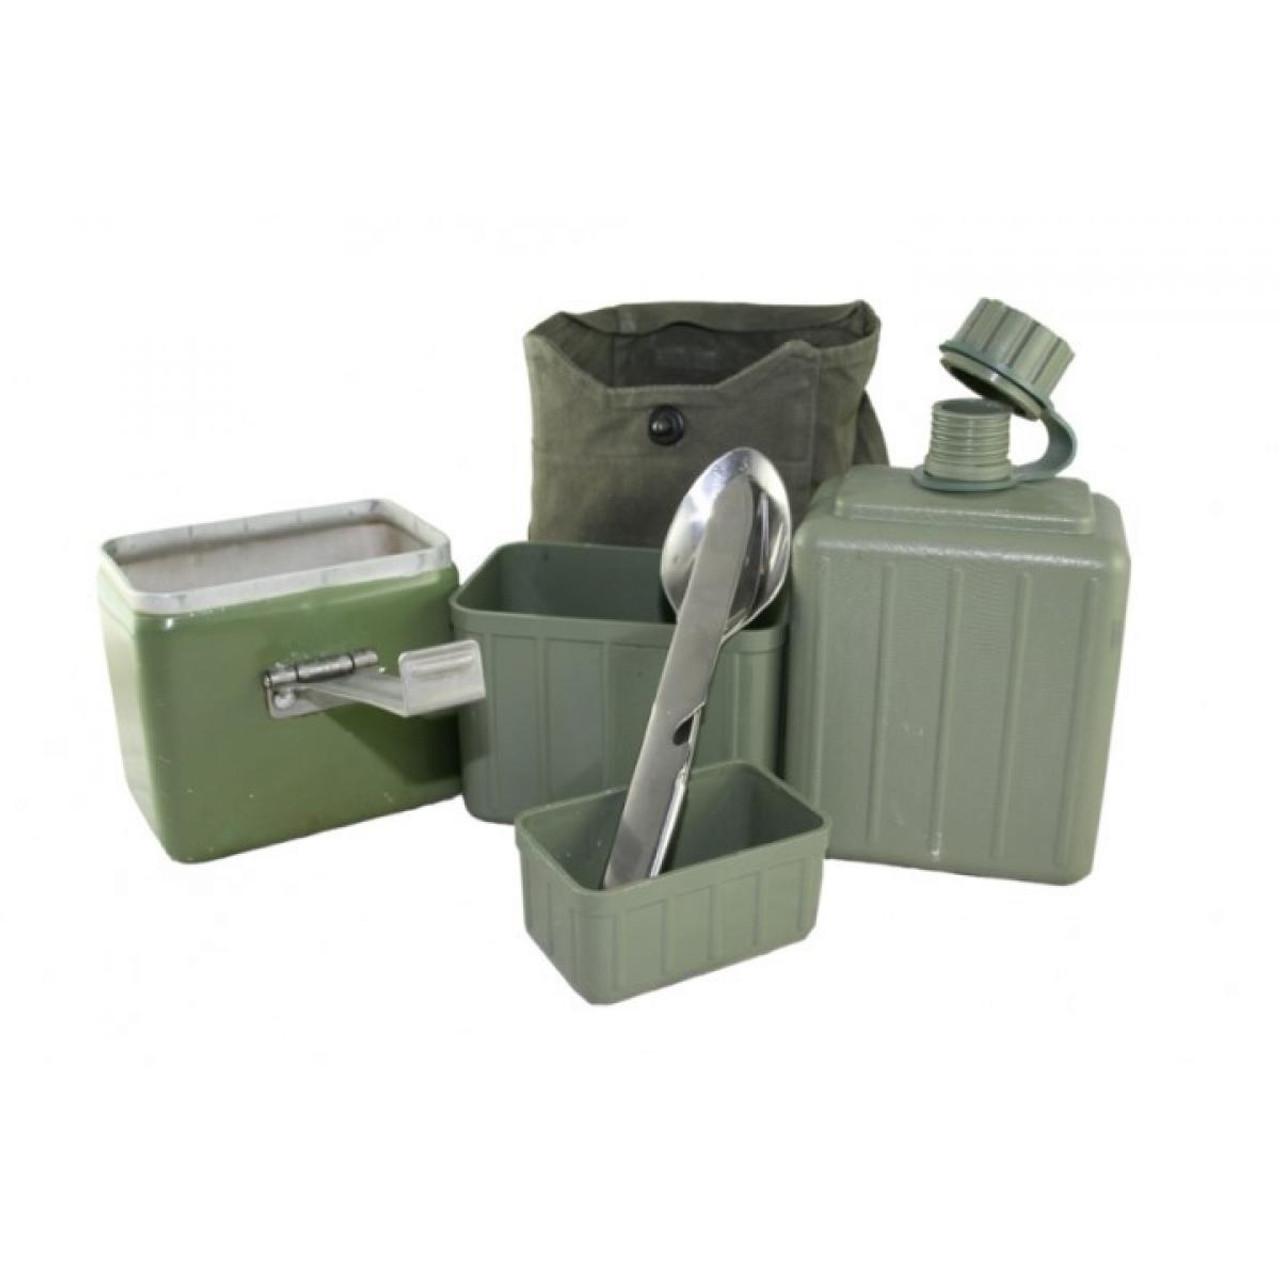 Yugoslavian Mess Kit with KFS - Used